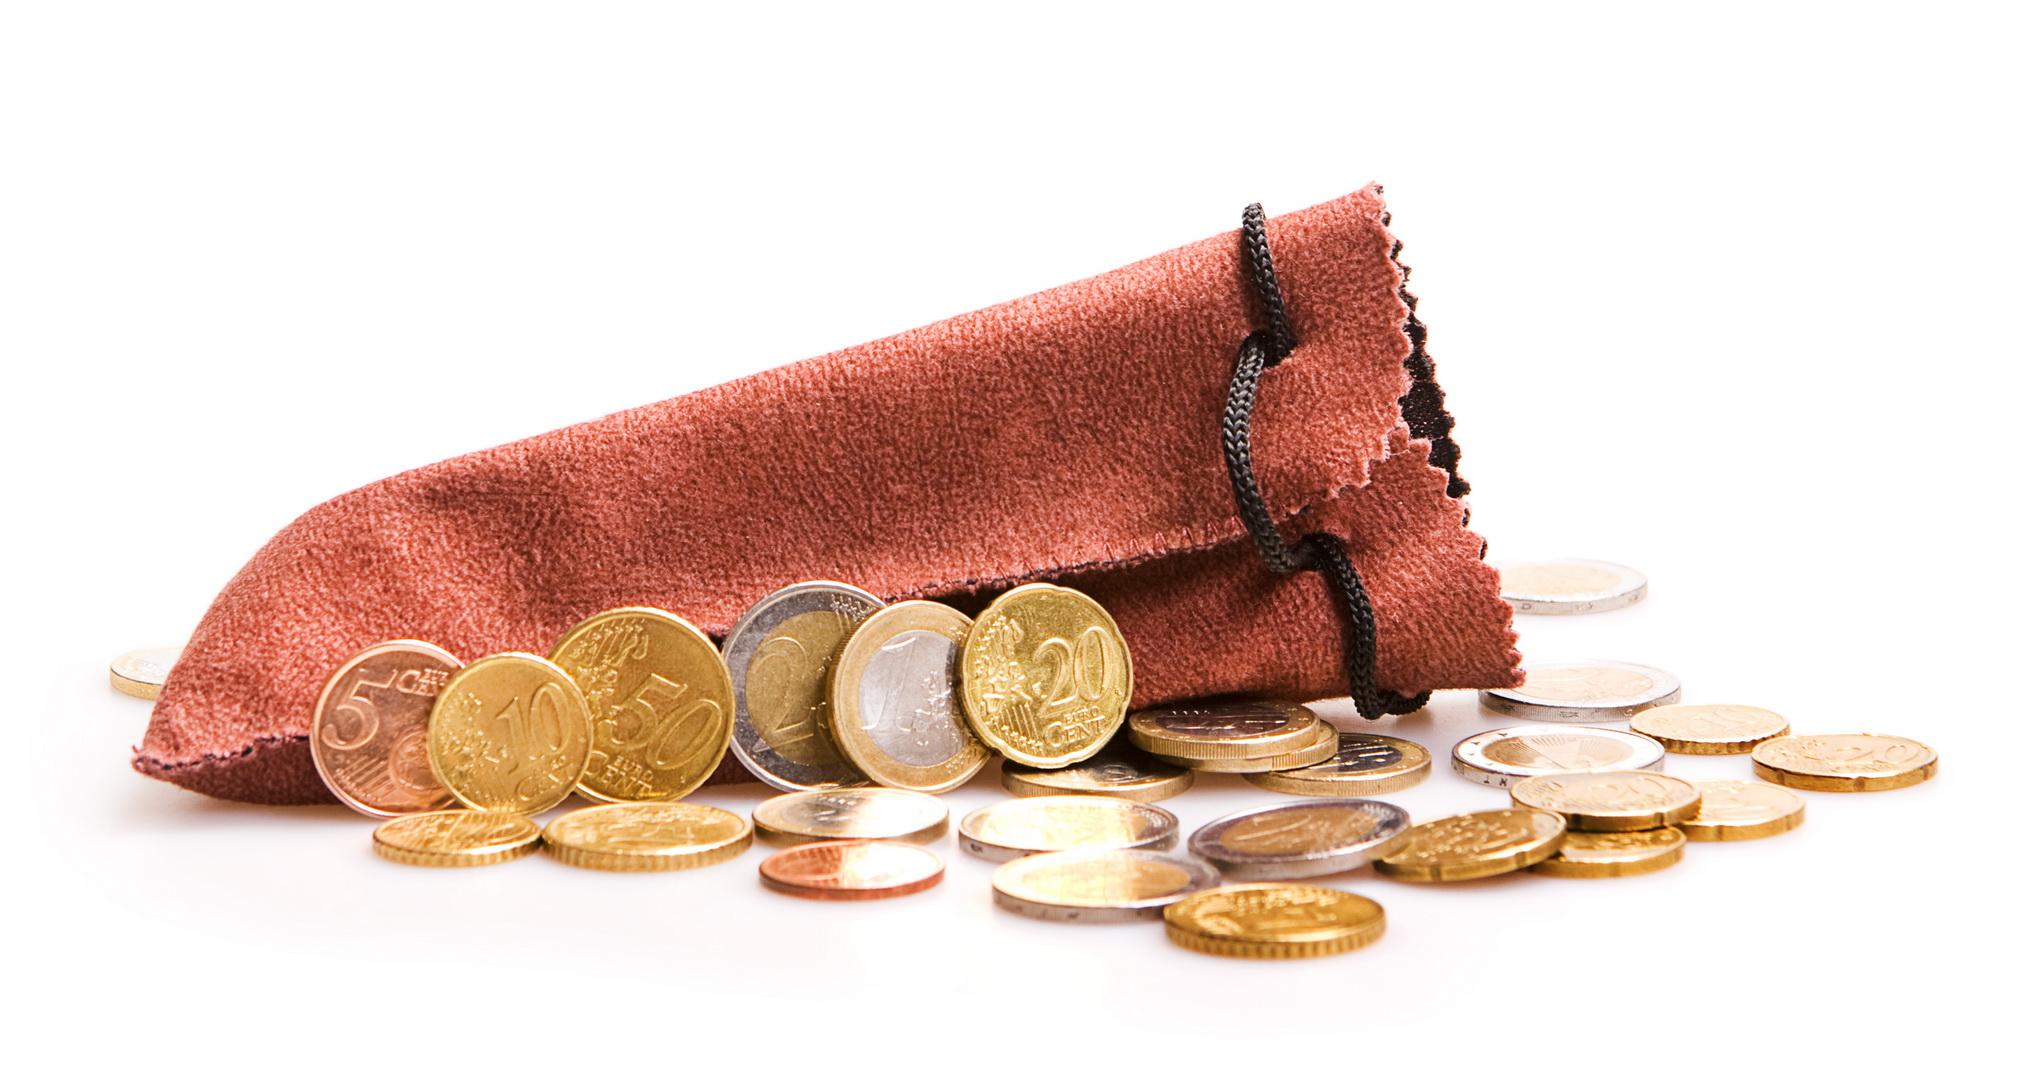 Euros depósitos estructurados